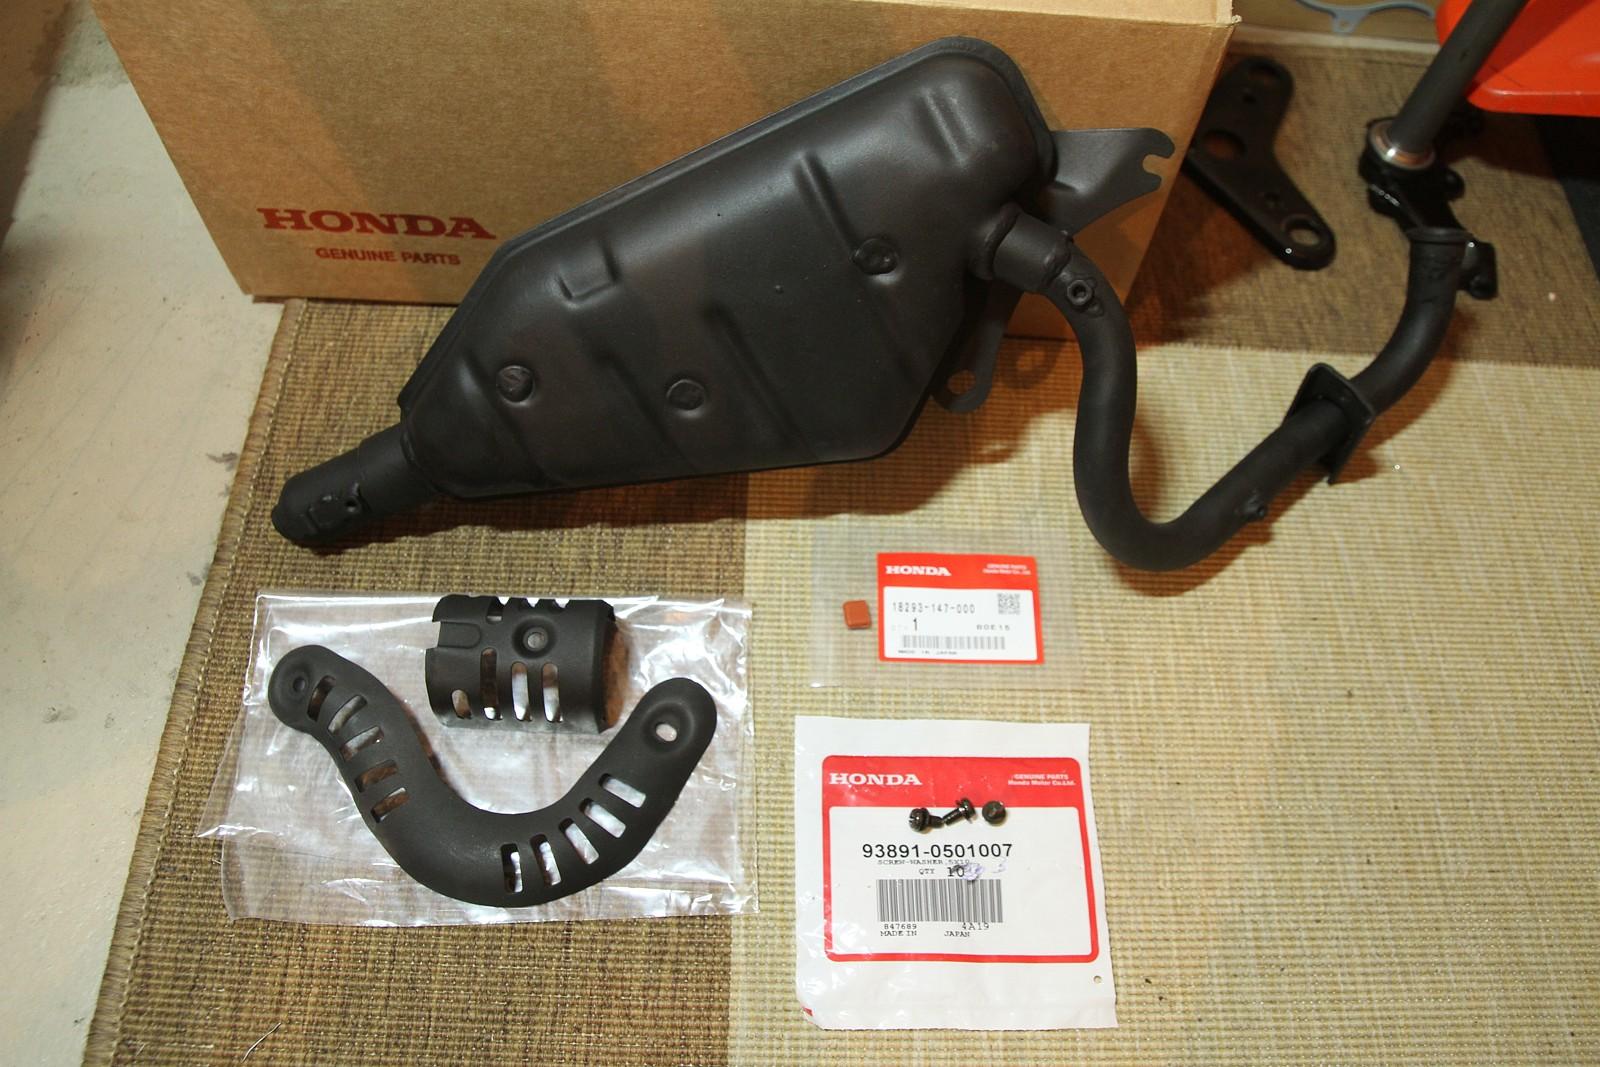 B28D5538-CA18-45E7-A5D3-D4821219660C - Godcho - Motocross Pictures - Vital MX